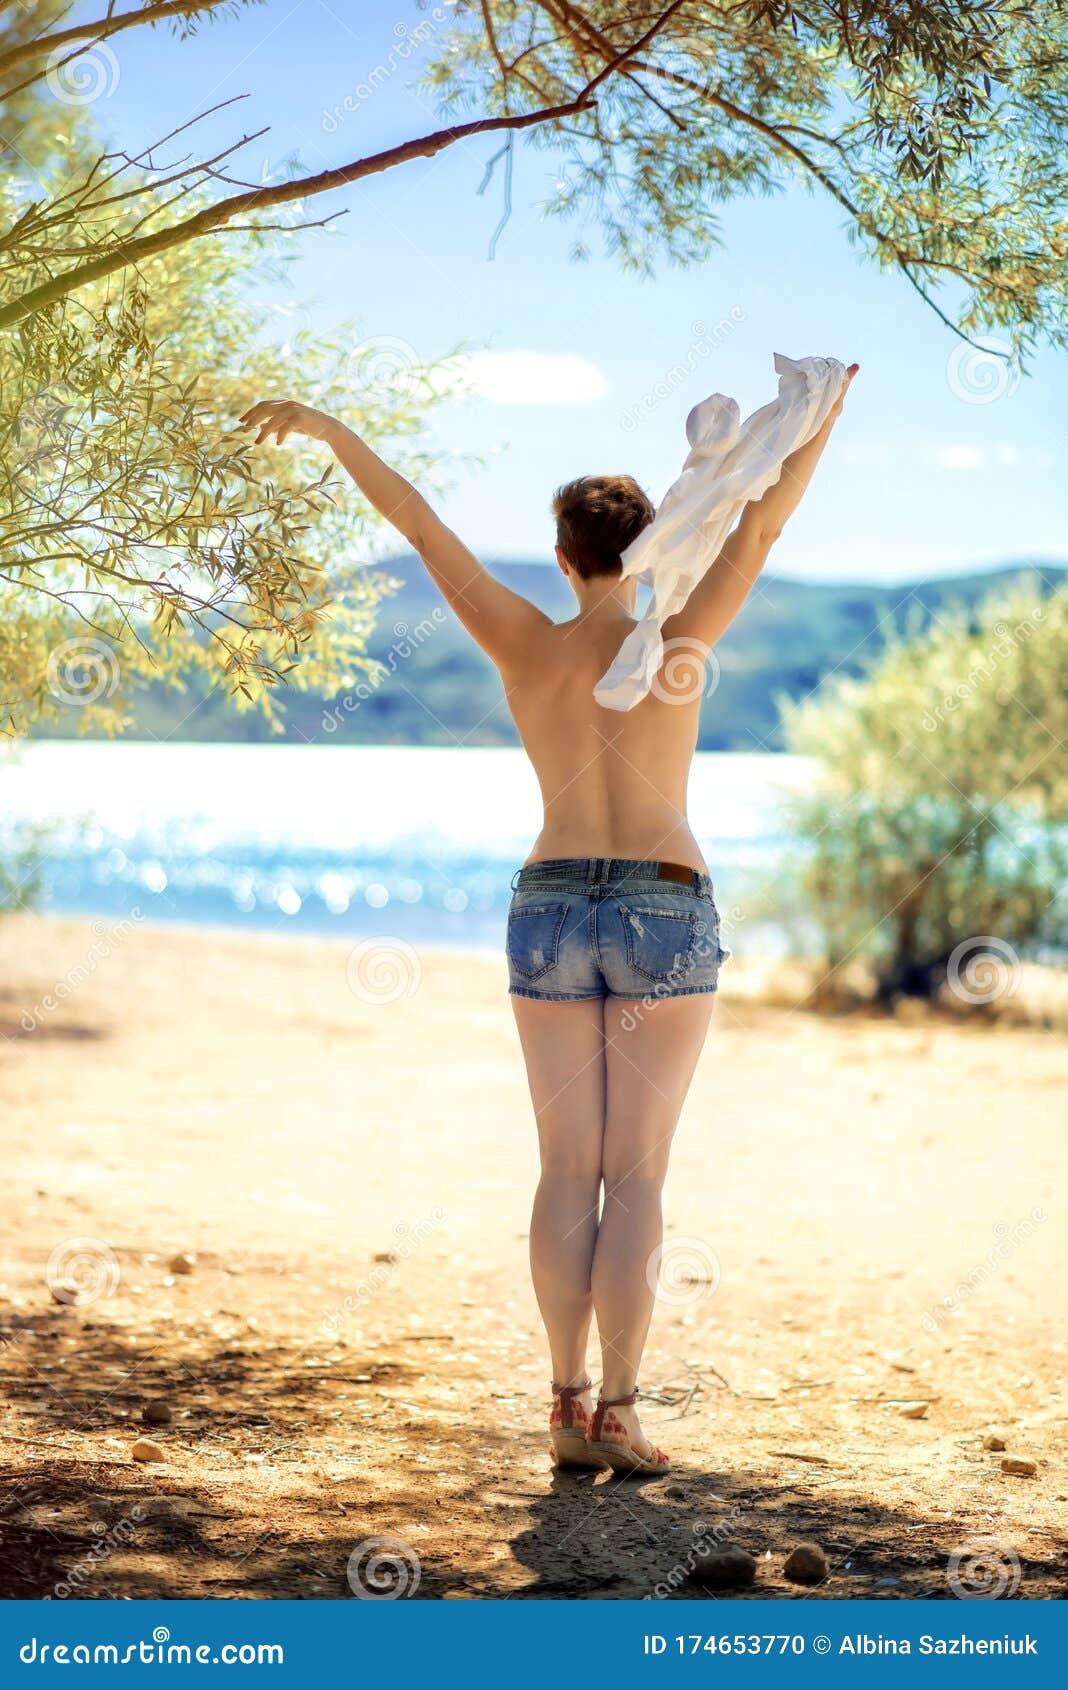 Young Beautiful Woman In White Short Tight Dress Posing